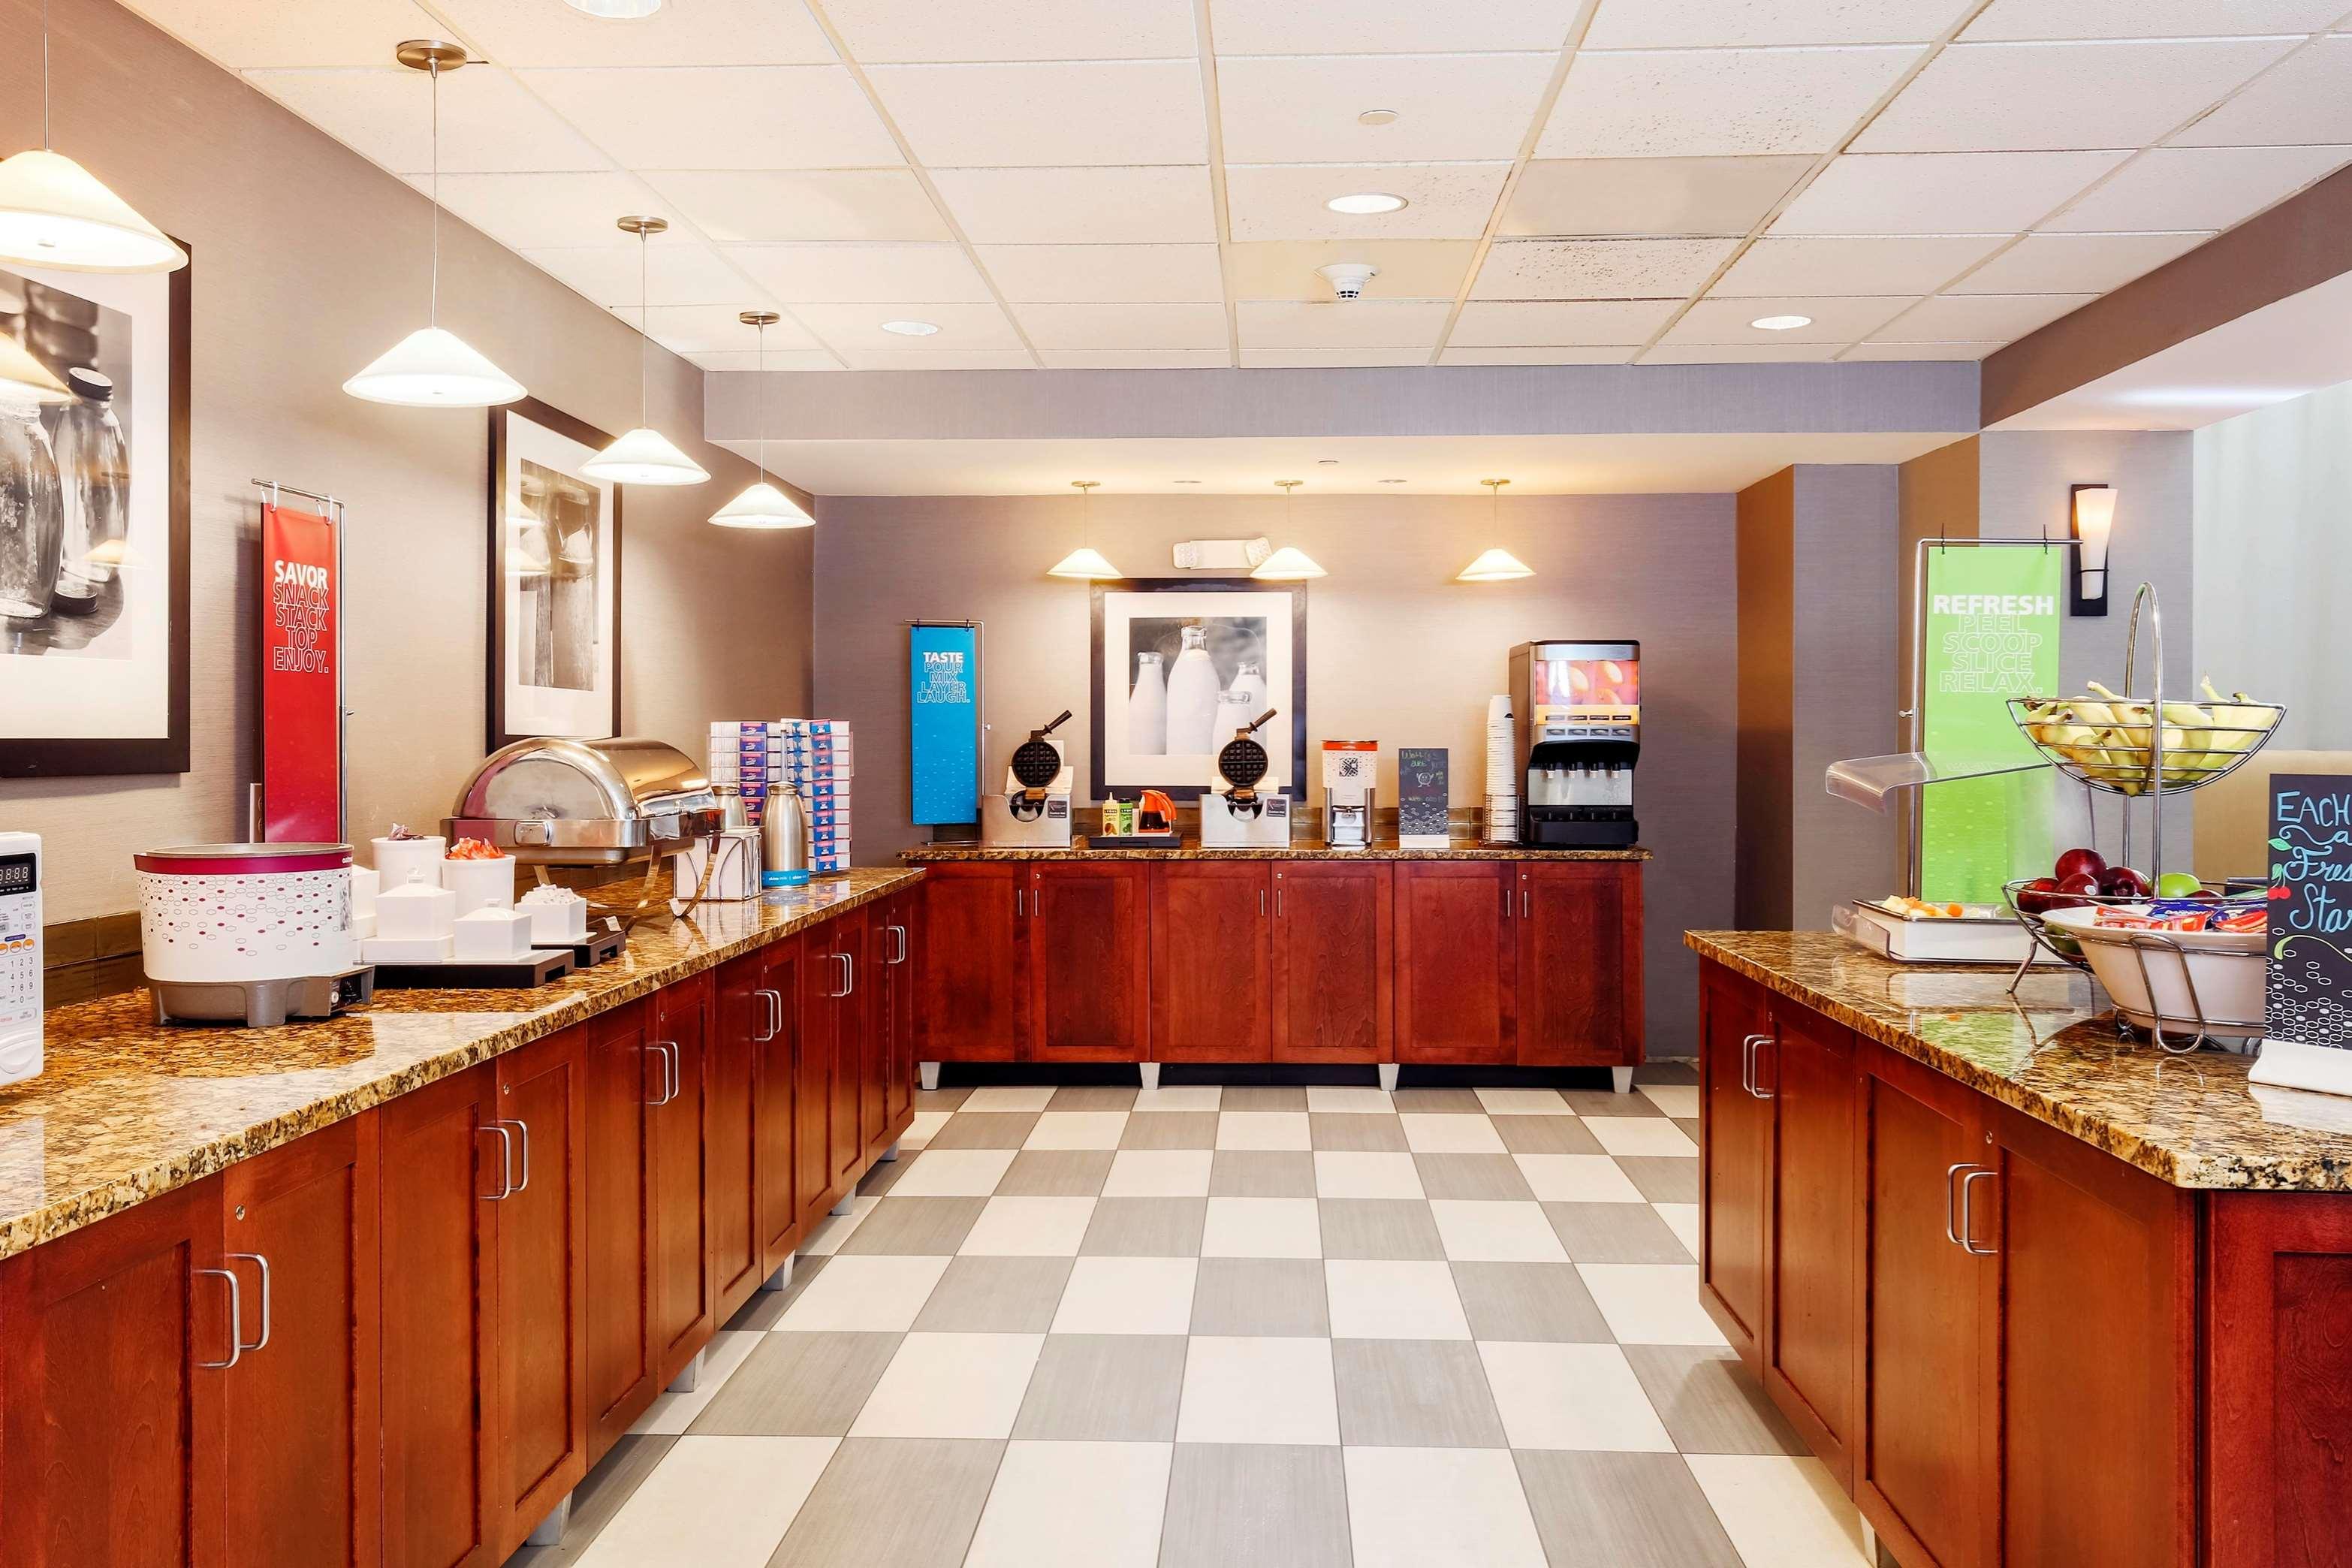 hampton inn suites poughkeepsie in poughkeepsie ny. Black Bedroom Furniture Sets. Home Design Ideas